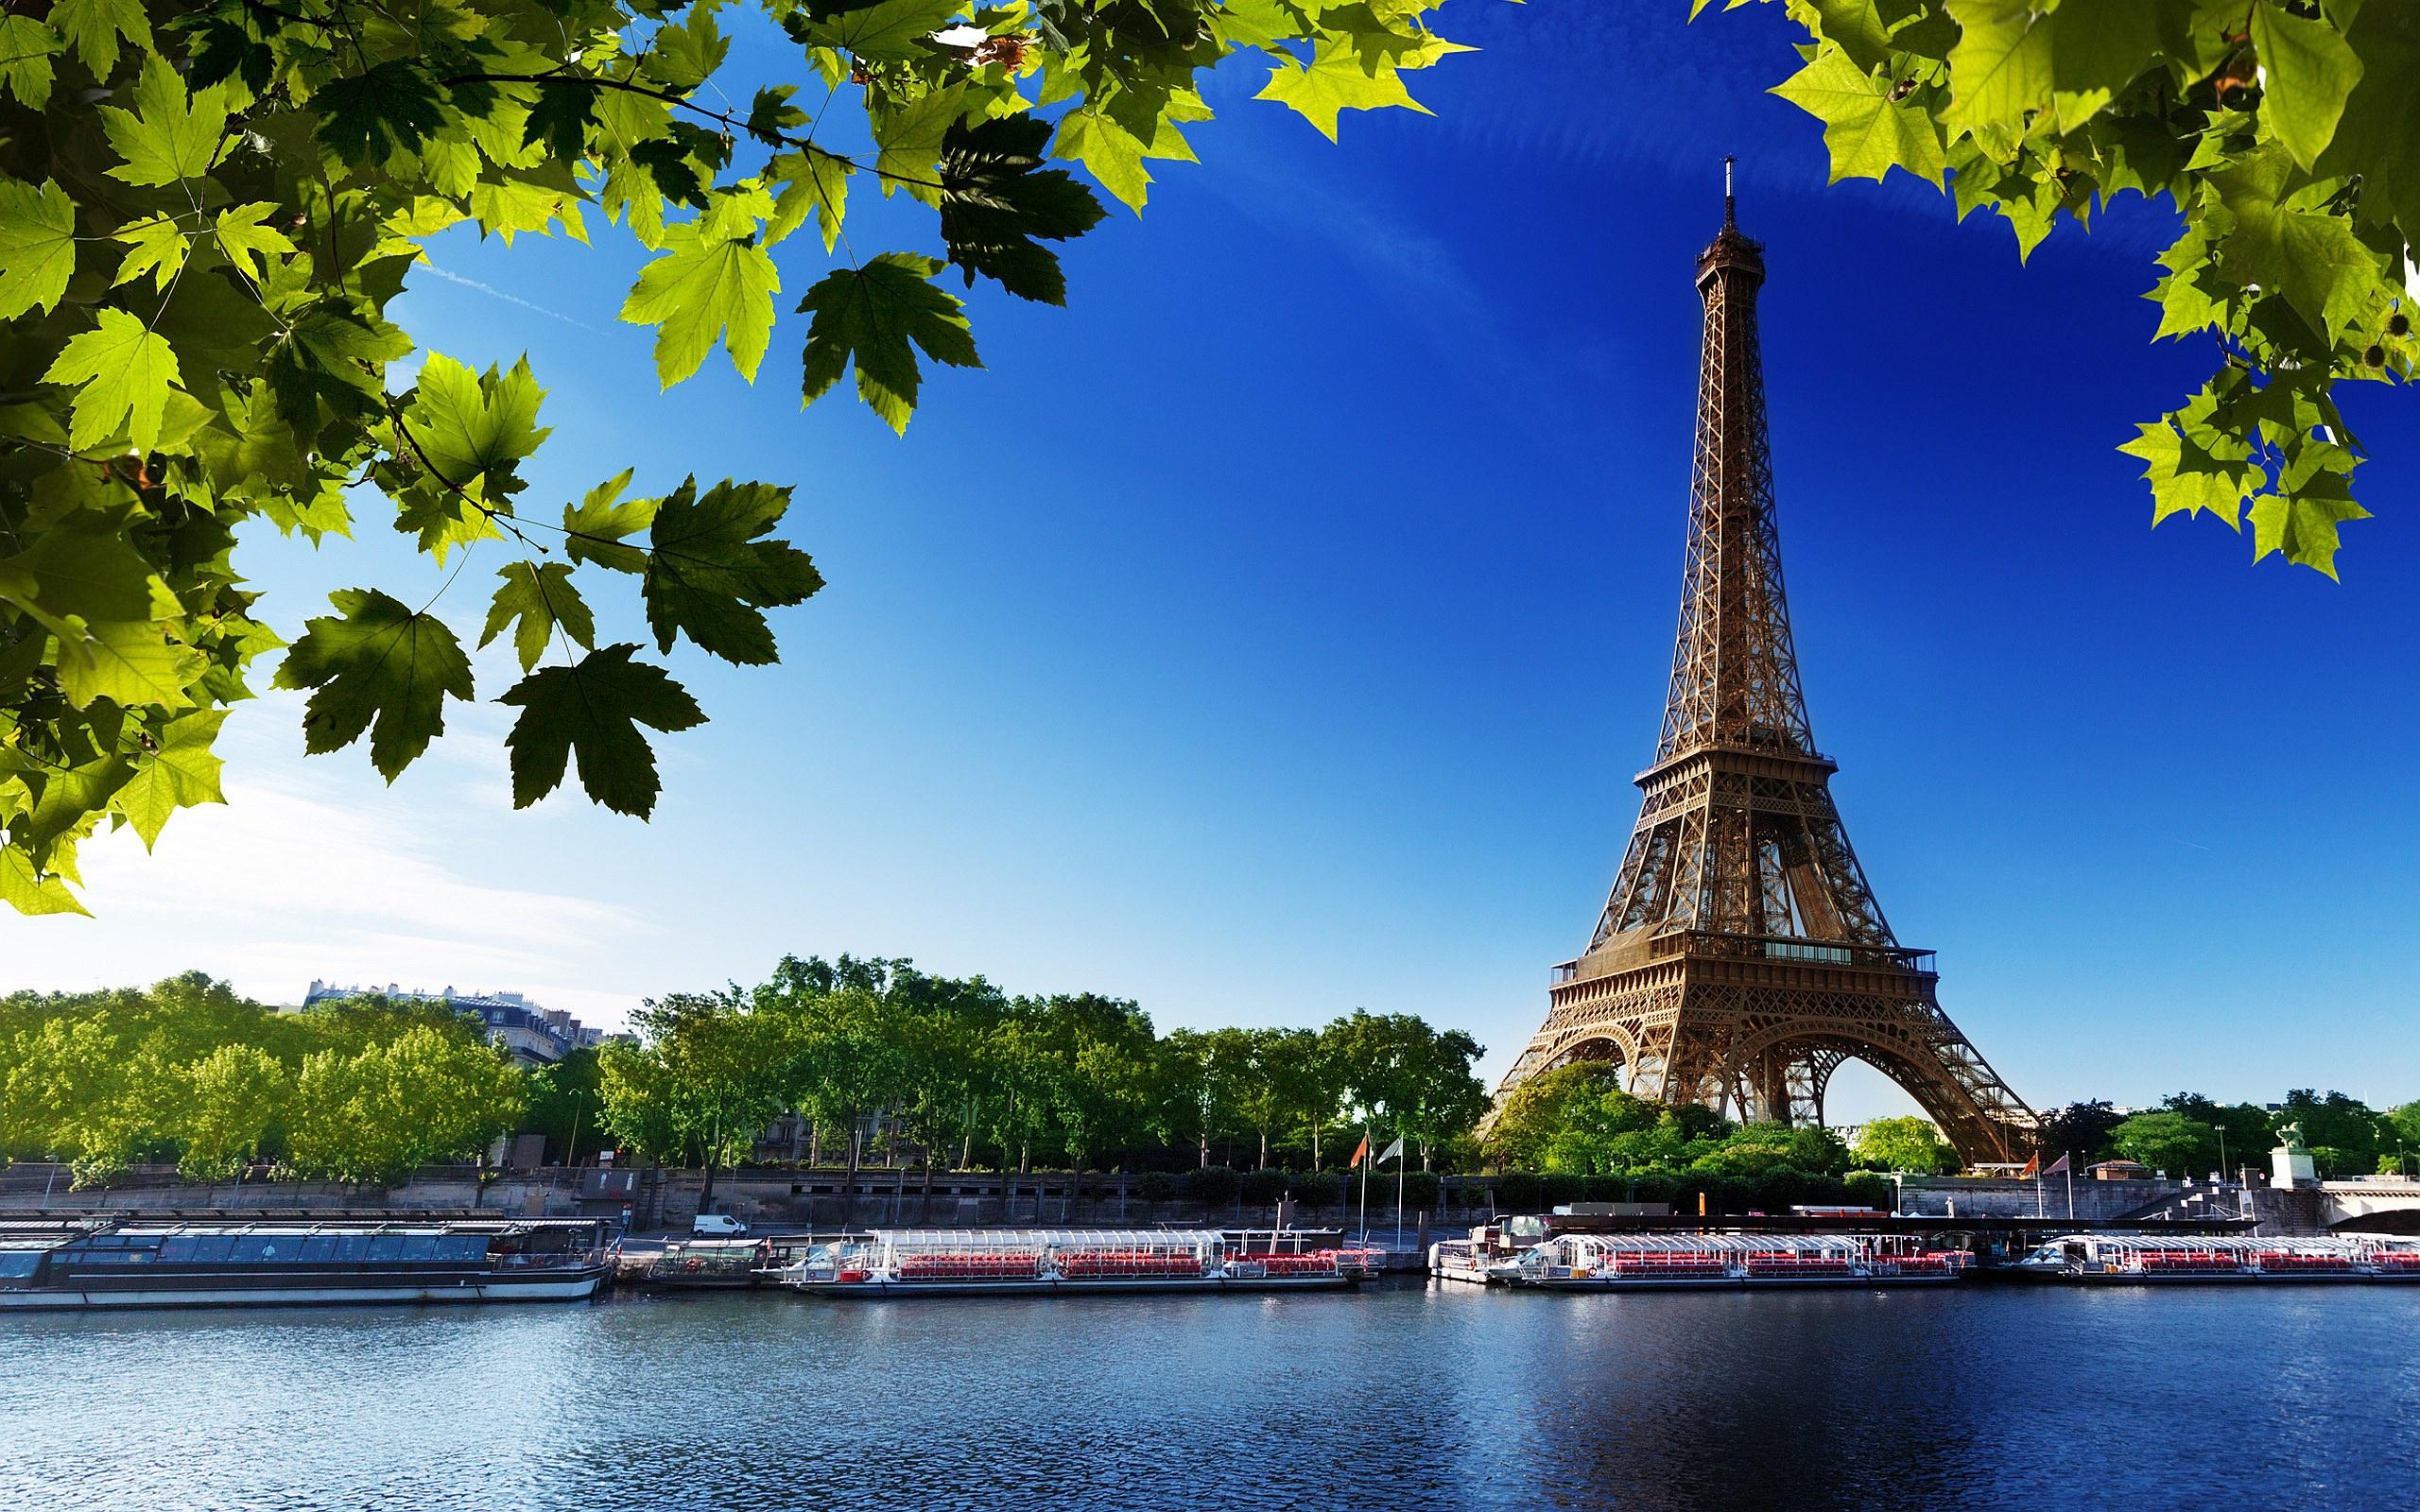 Eiffel Tower Summer